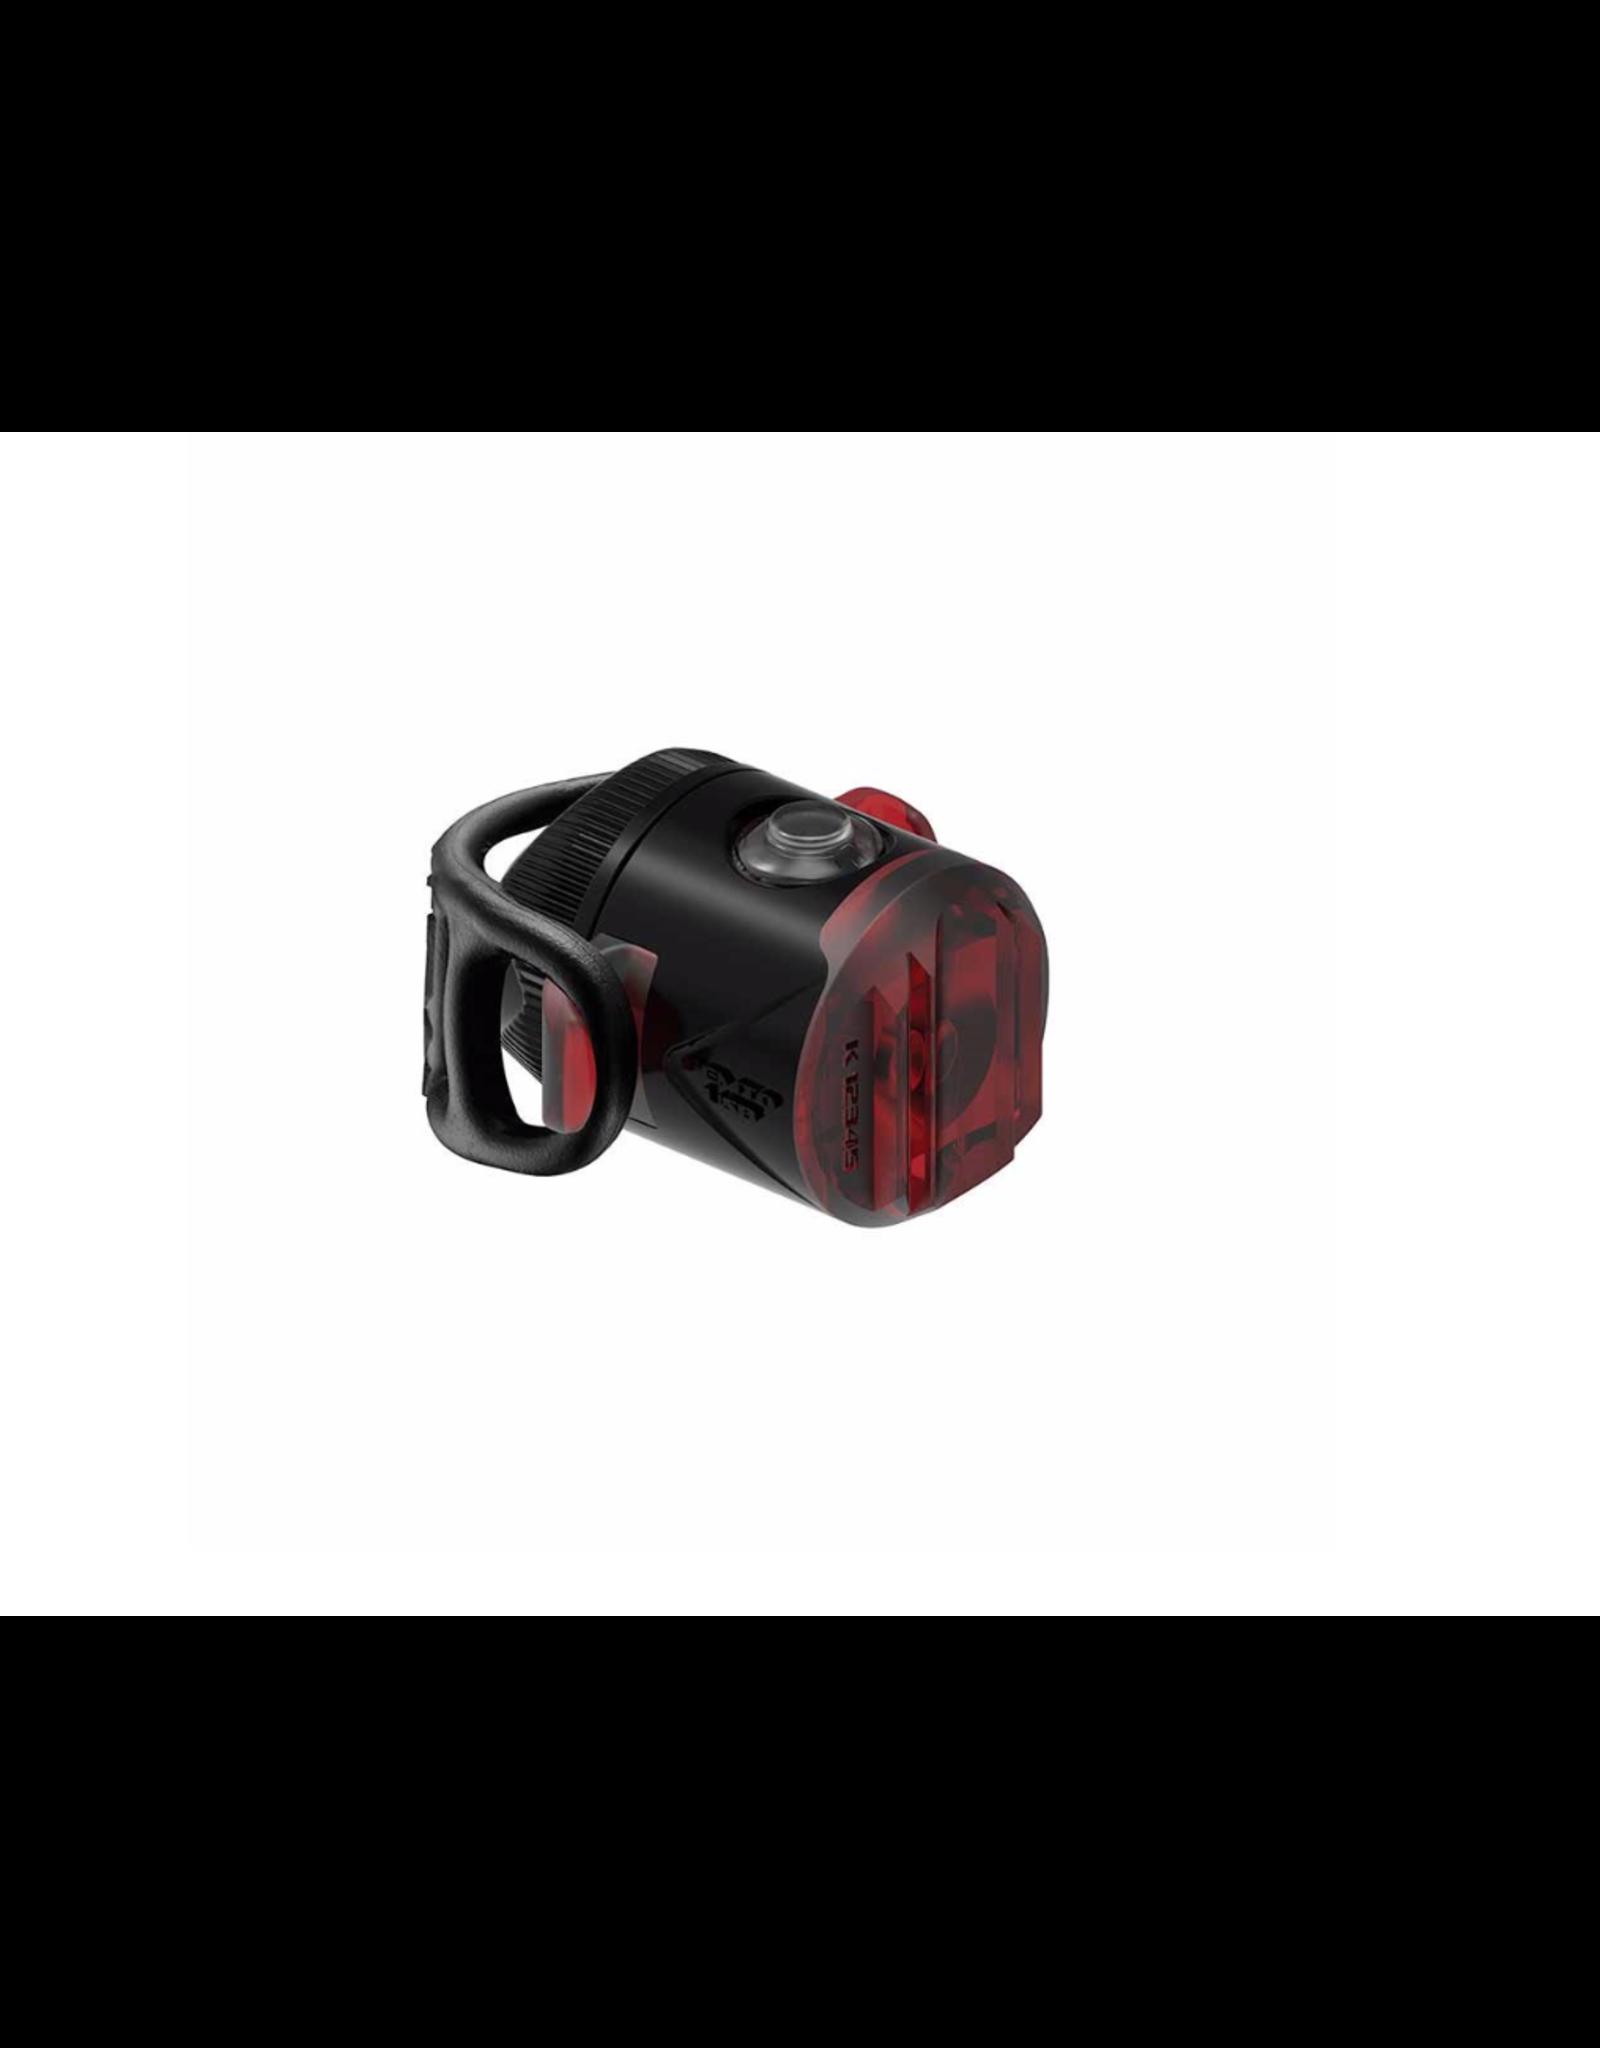 LEZYNE Lezyne Femto USB Drive Lights